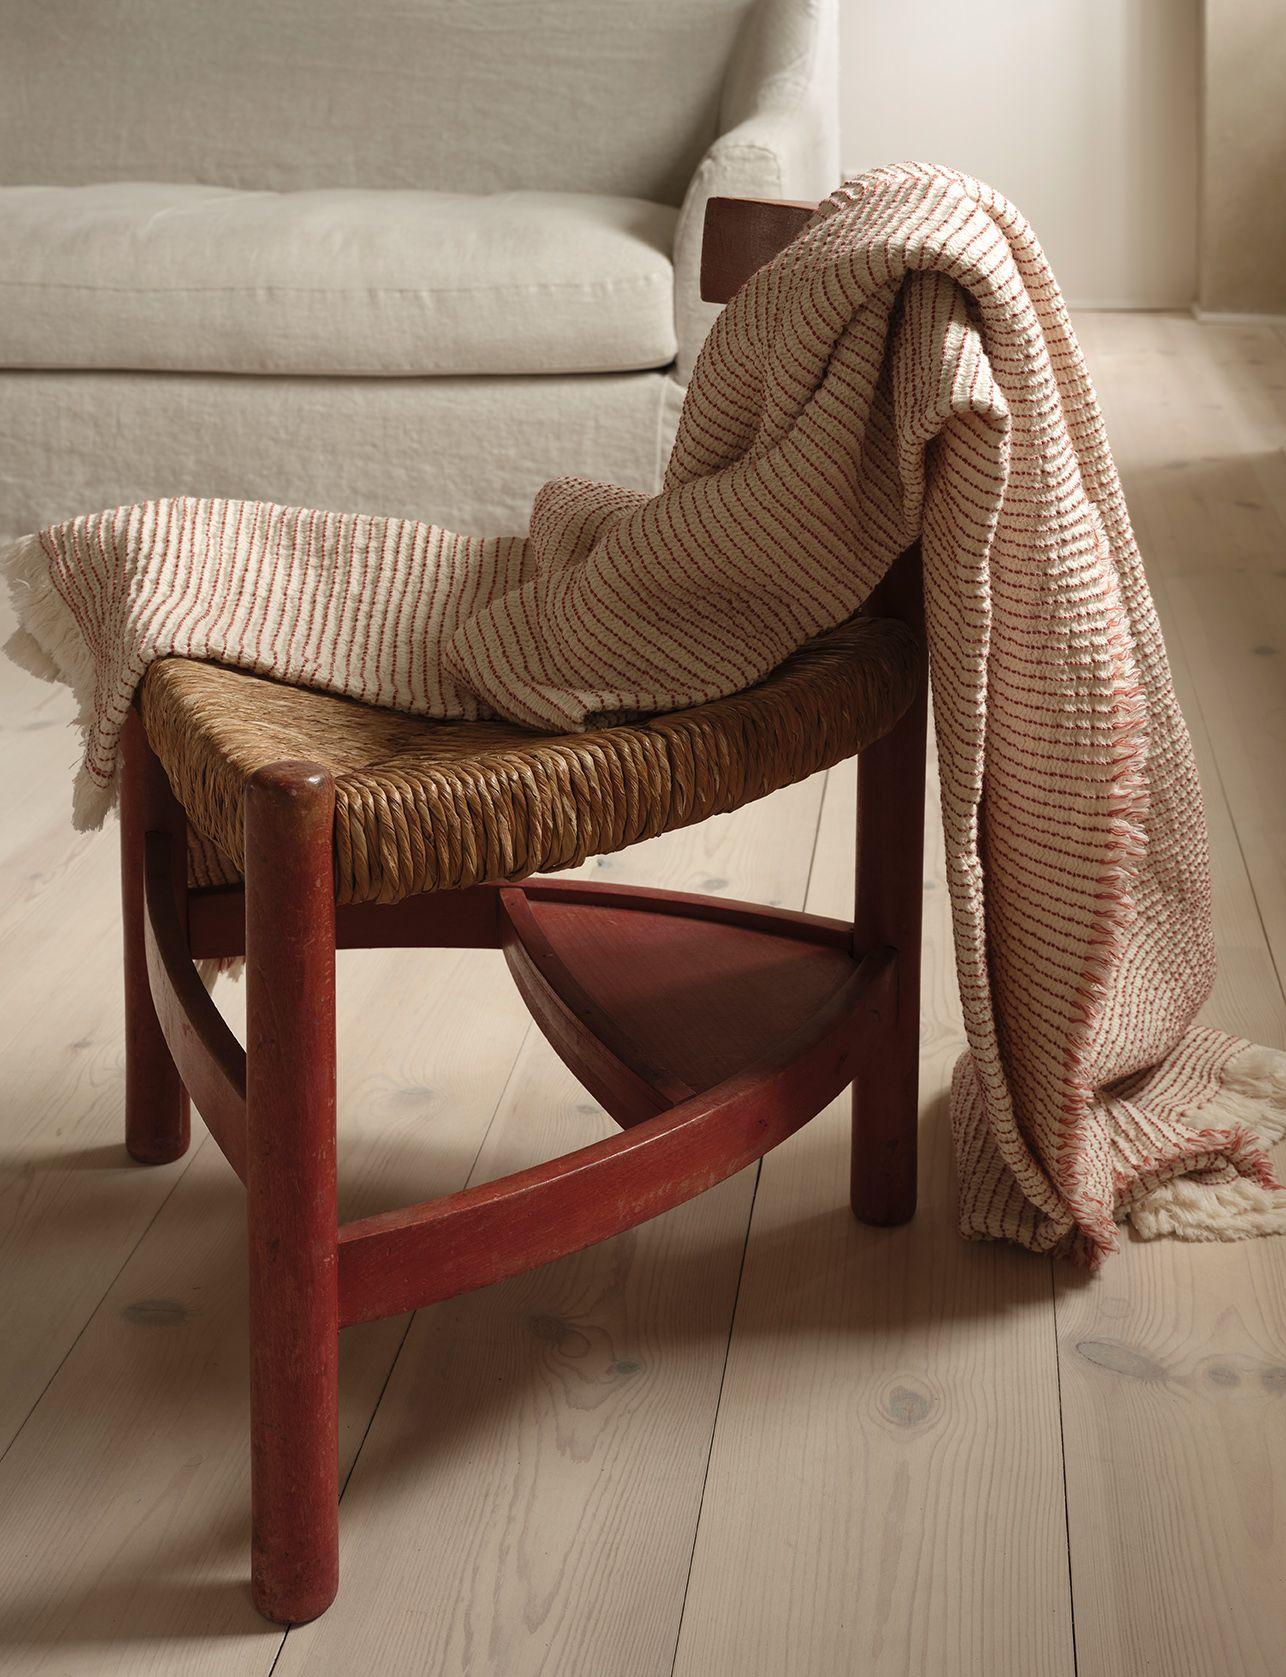 Cotton Blanket Zara Home Cuisine Appartement Deco